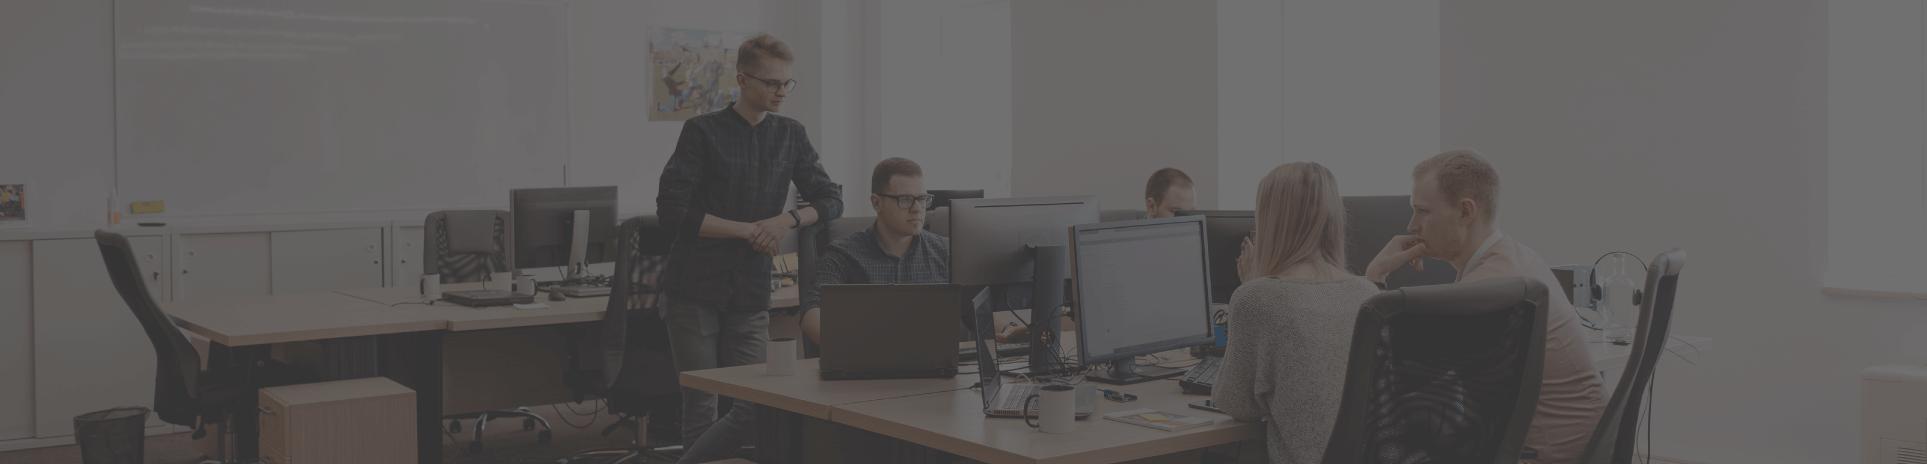 Magento 2 Marketplace Seller ElasticSuite